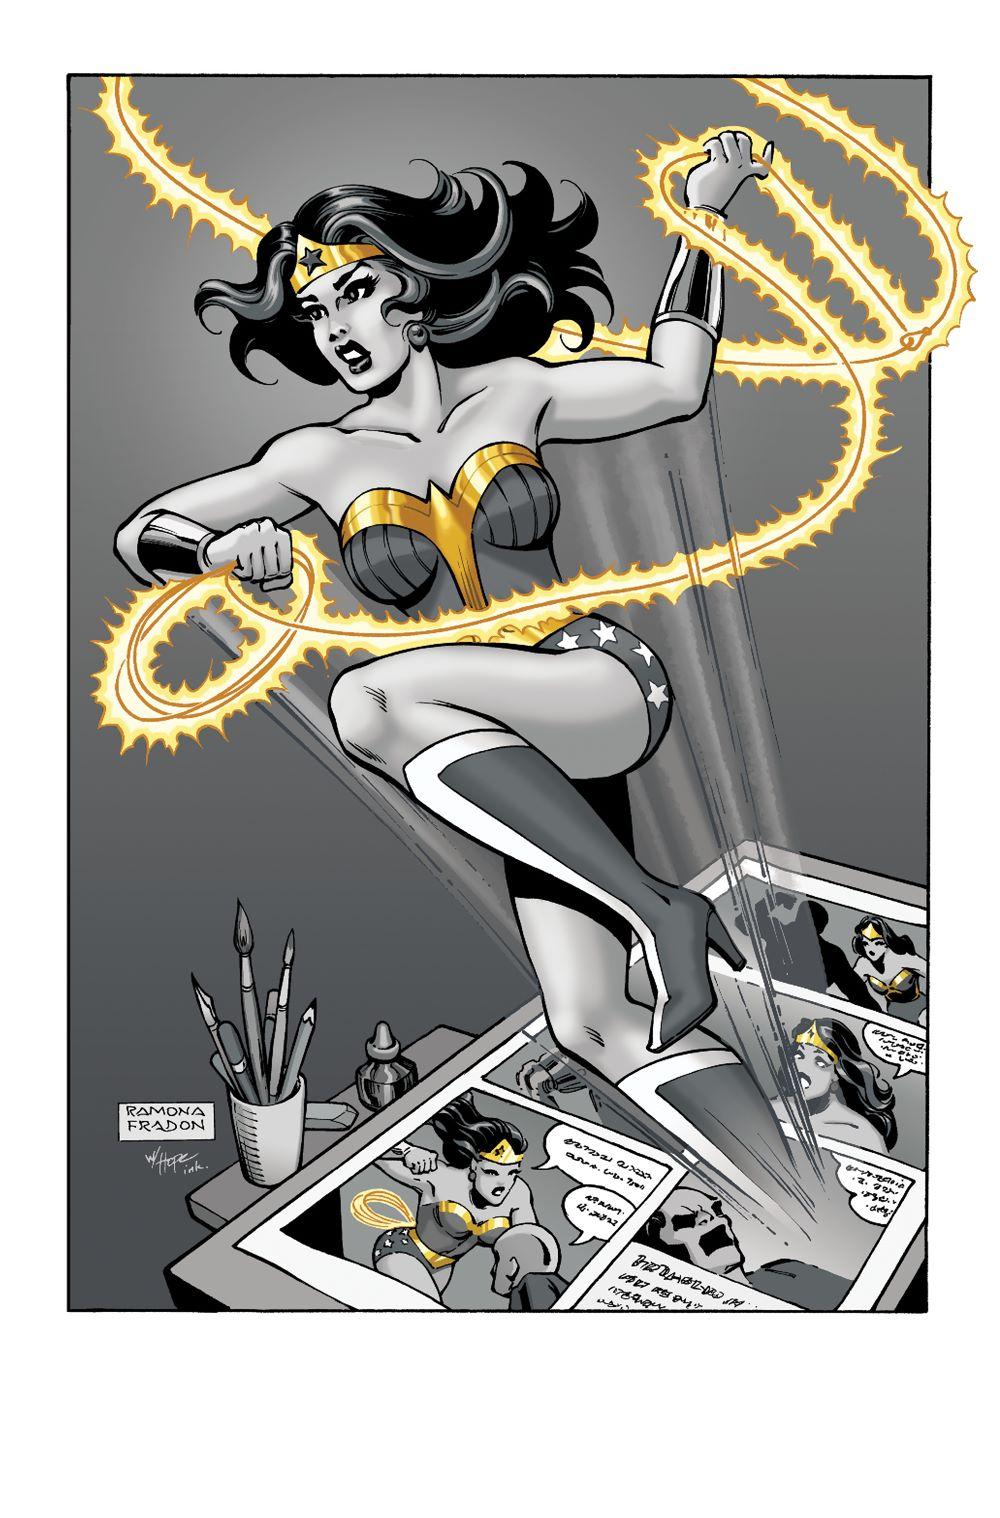 WW_BandG_Cv1_1in25_var_WITHOUTTRADEDRESS3 DC Comics June 2021 Solicitations